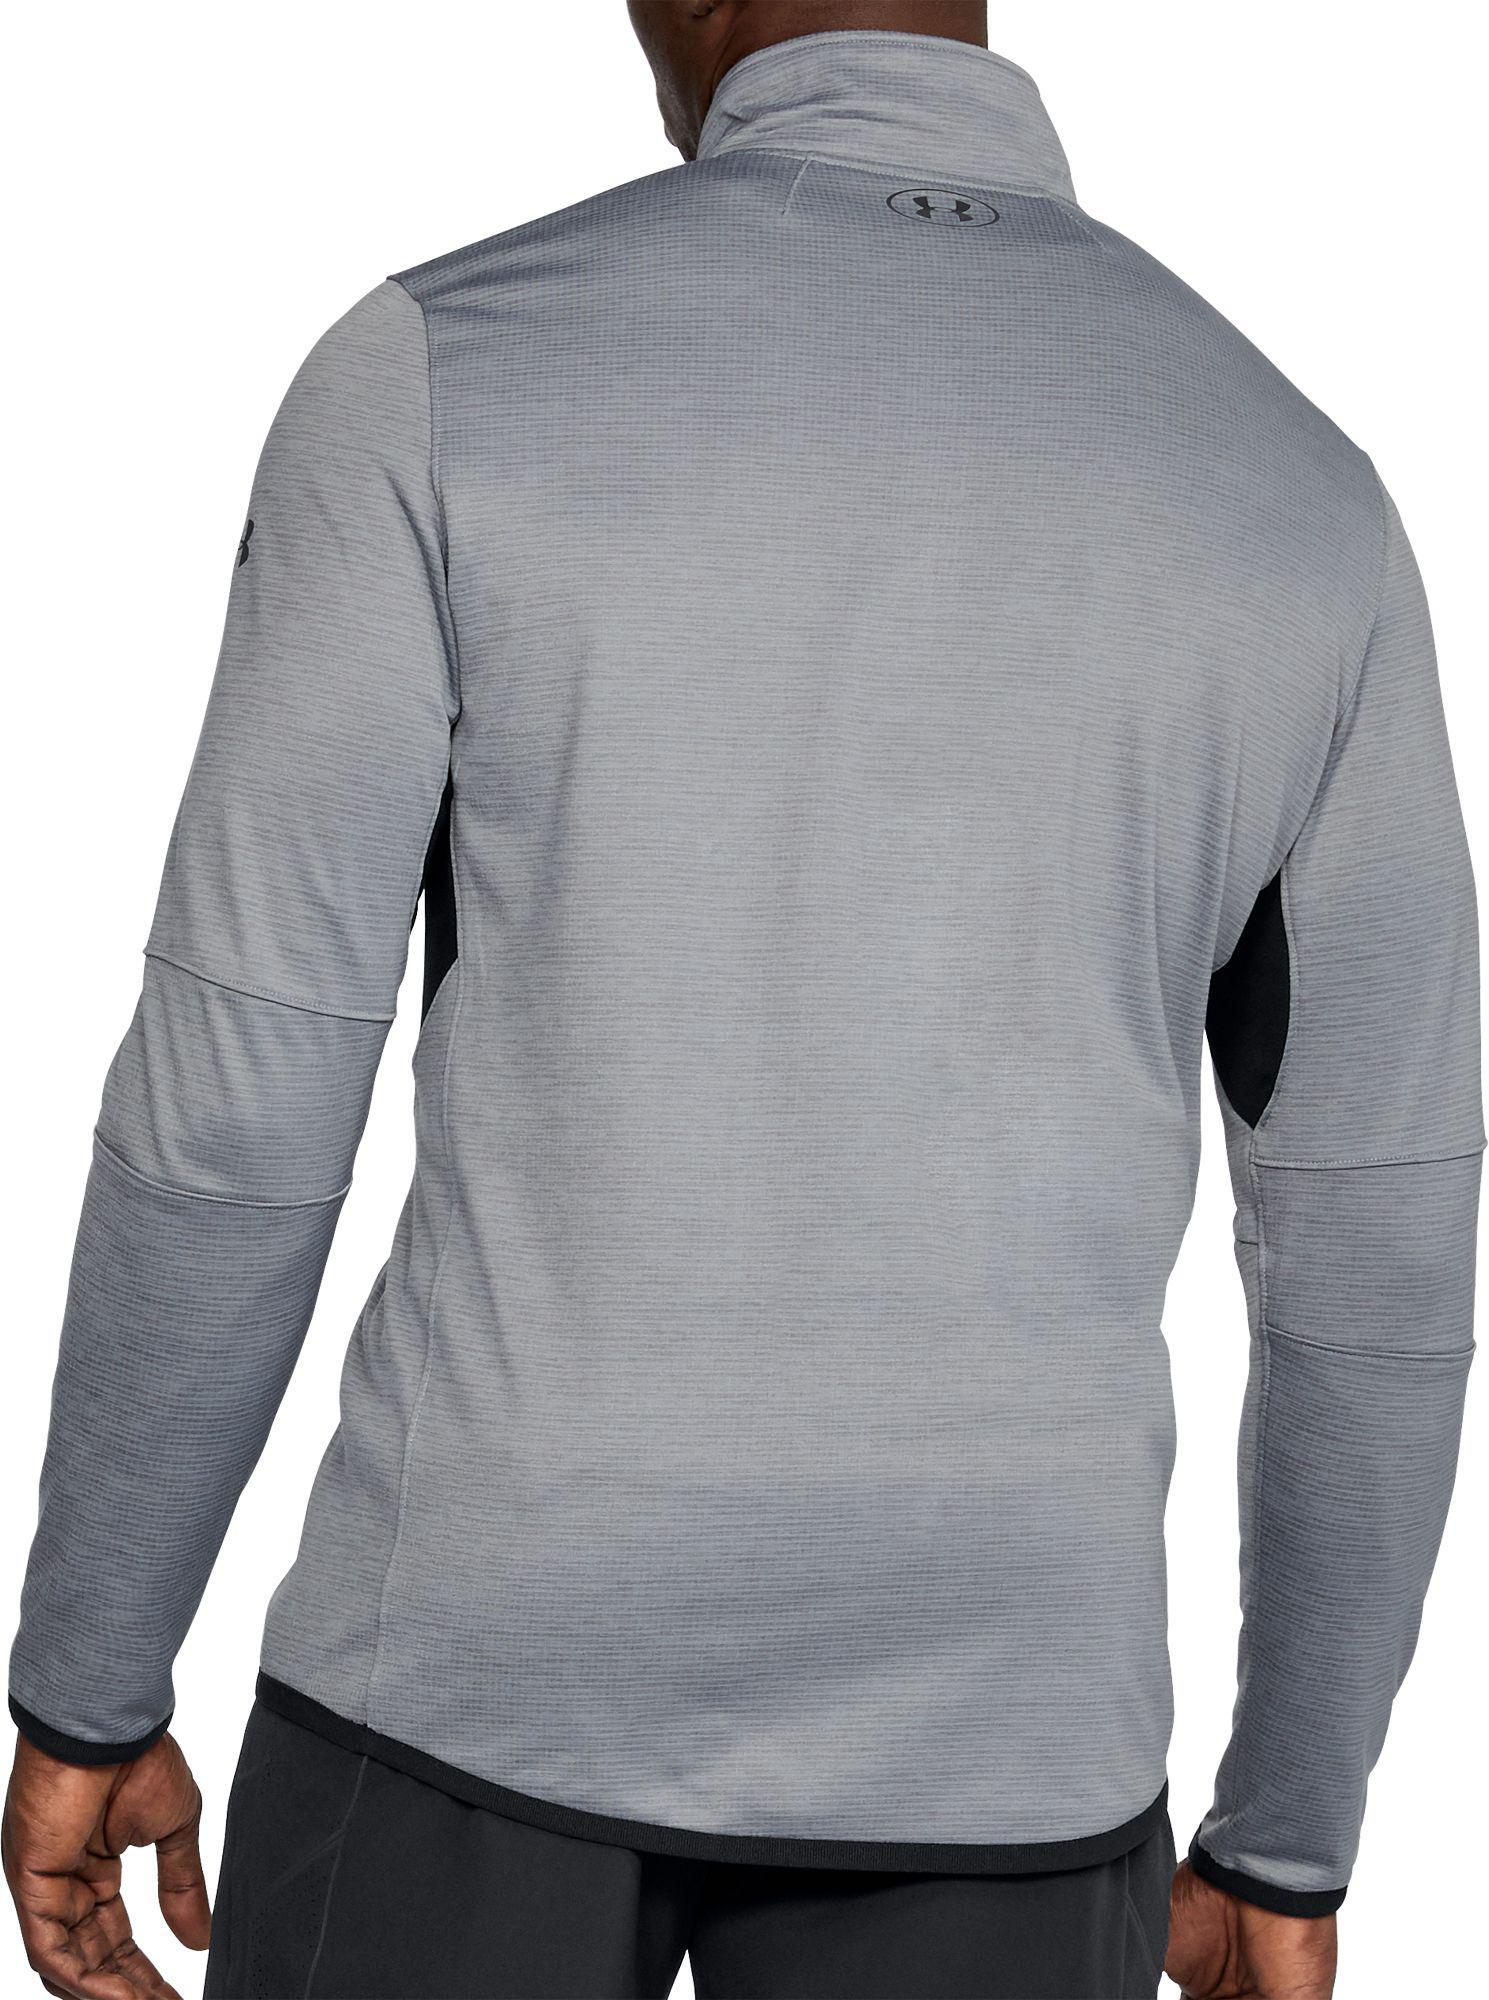 f6b7938b Under Armour Coldgear Reactor 1/4 Zip Long Sleeve T-shirt in Gray ...